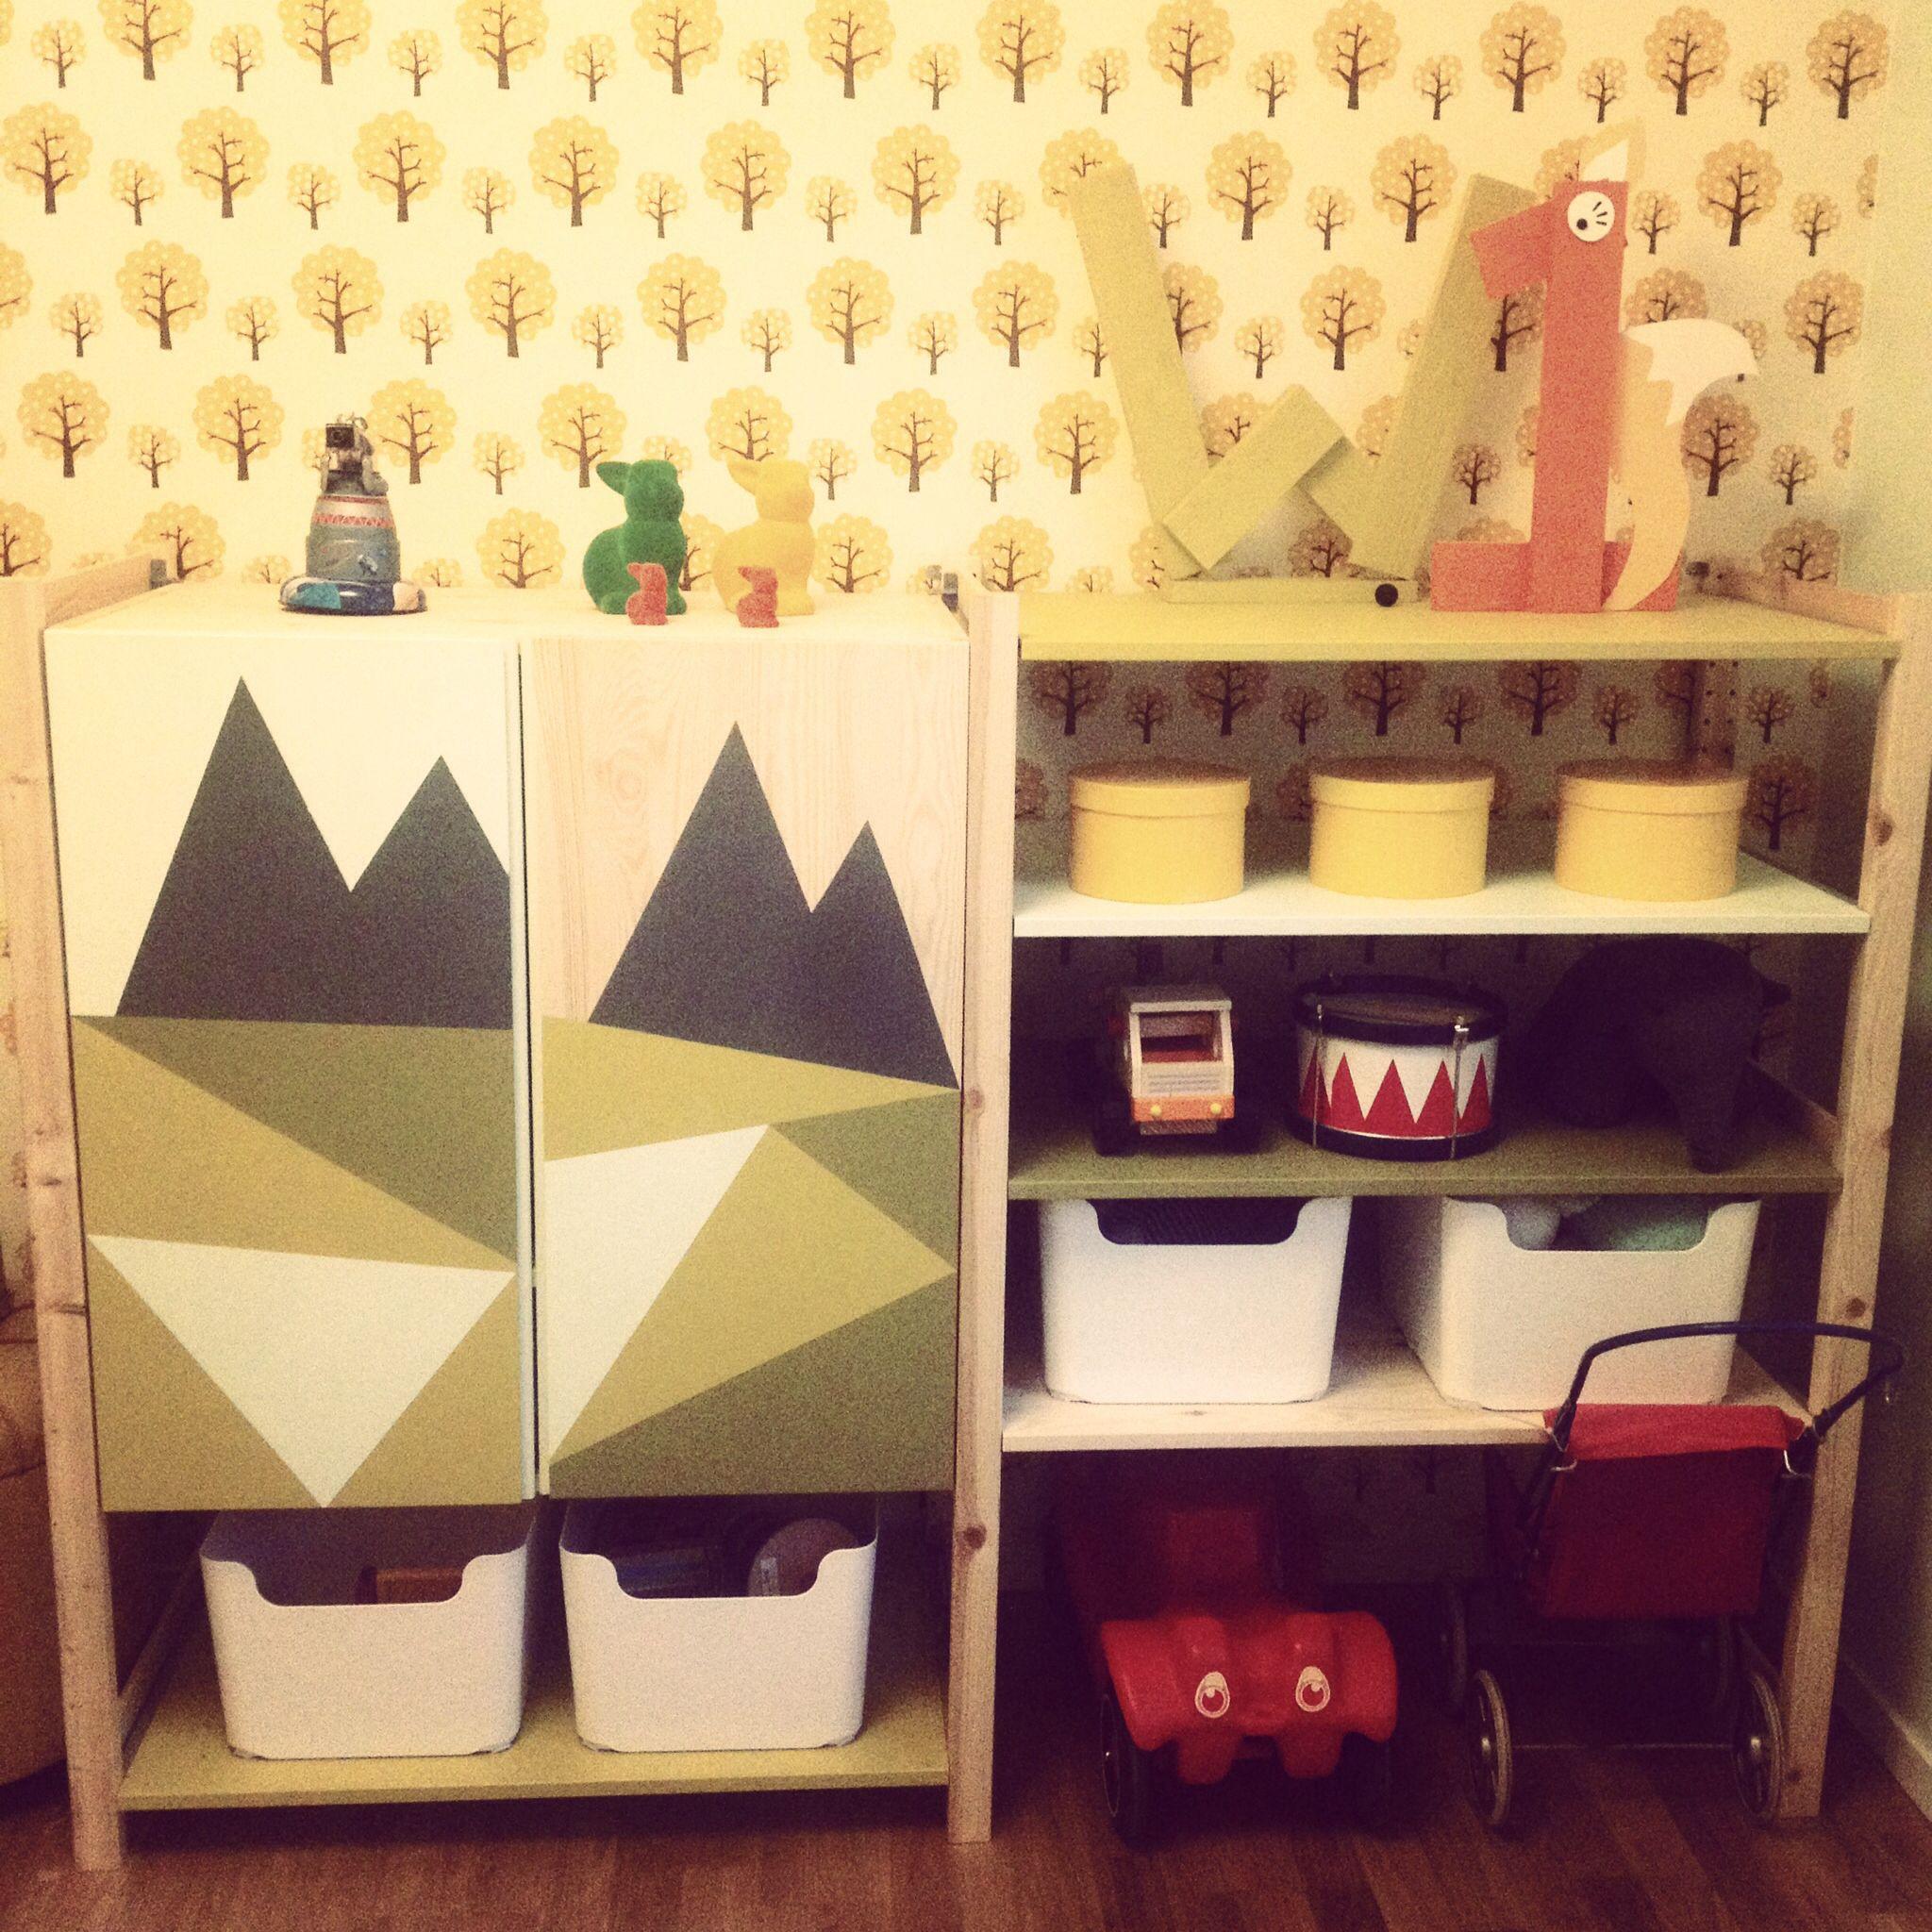 niedrige ikea kombination regalbretter weglassen um platz f r fahrzeuge zu haben kinderzimmer. Black Bedroom Furniture Sets. Home Design Ideas